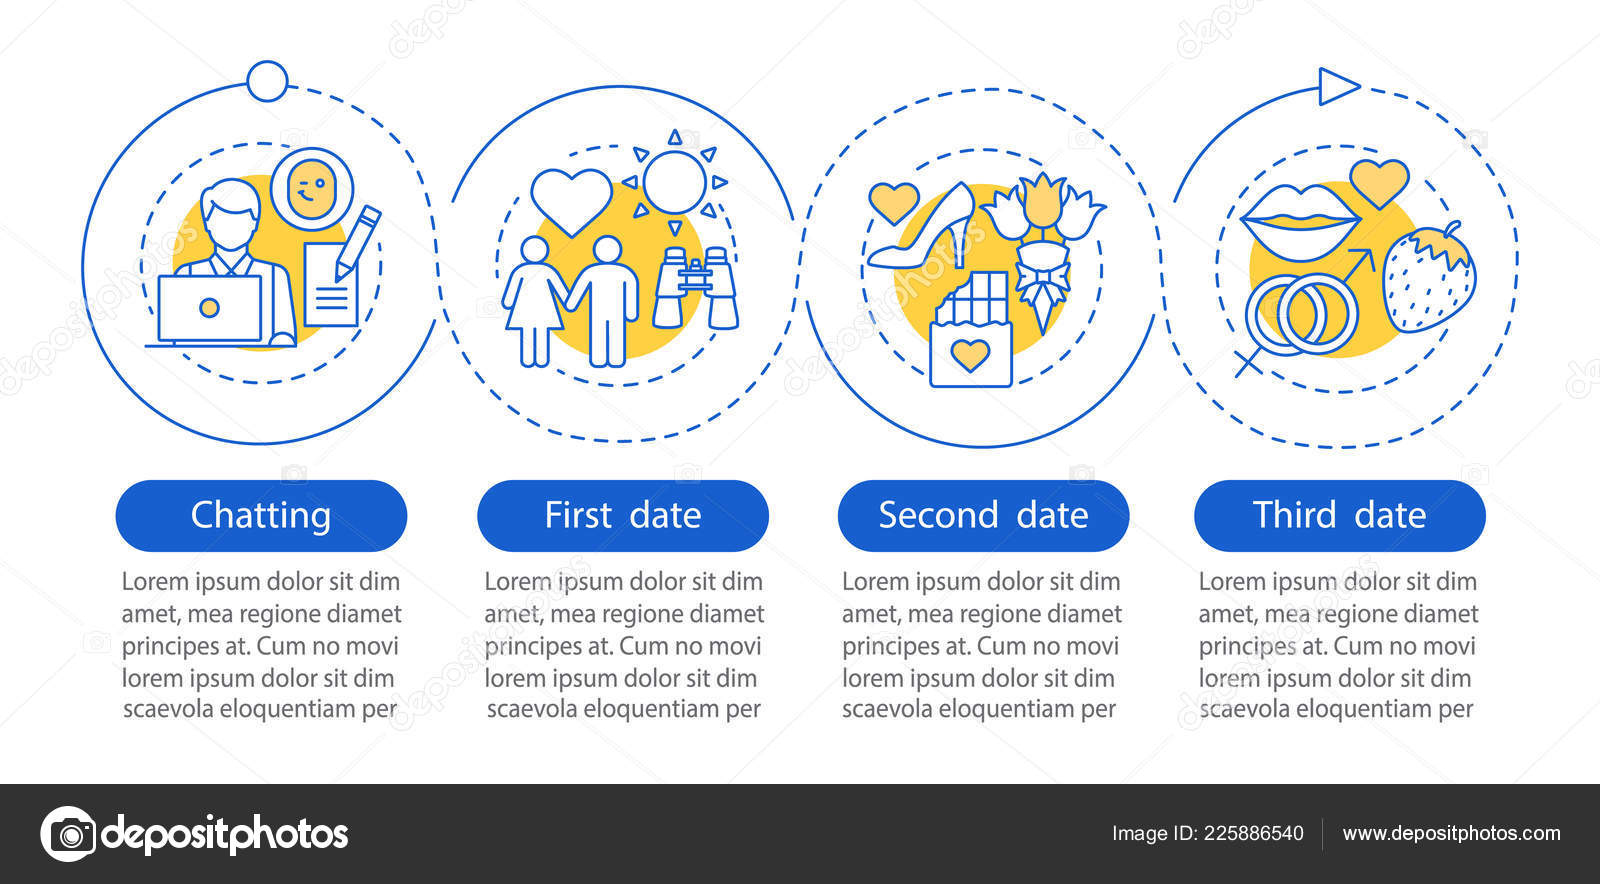 presentation online dating Trots co op matchmaking